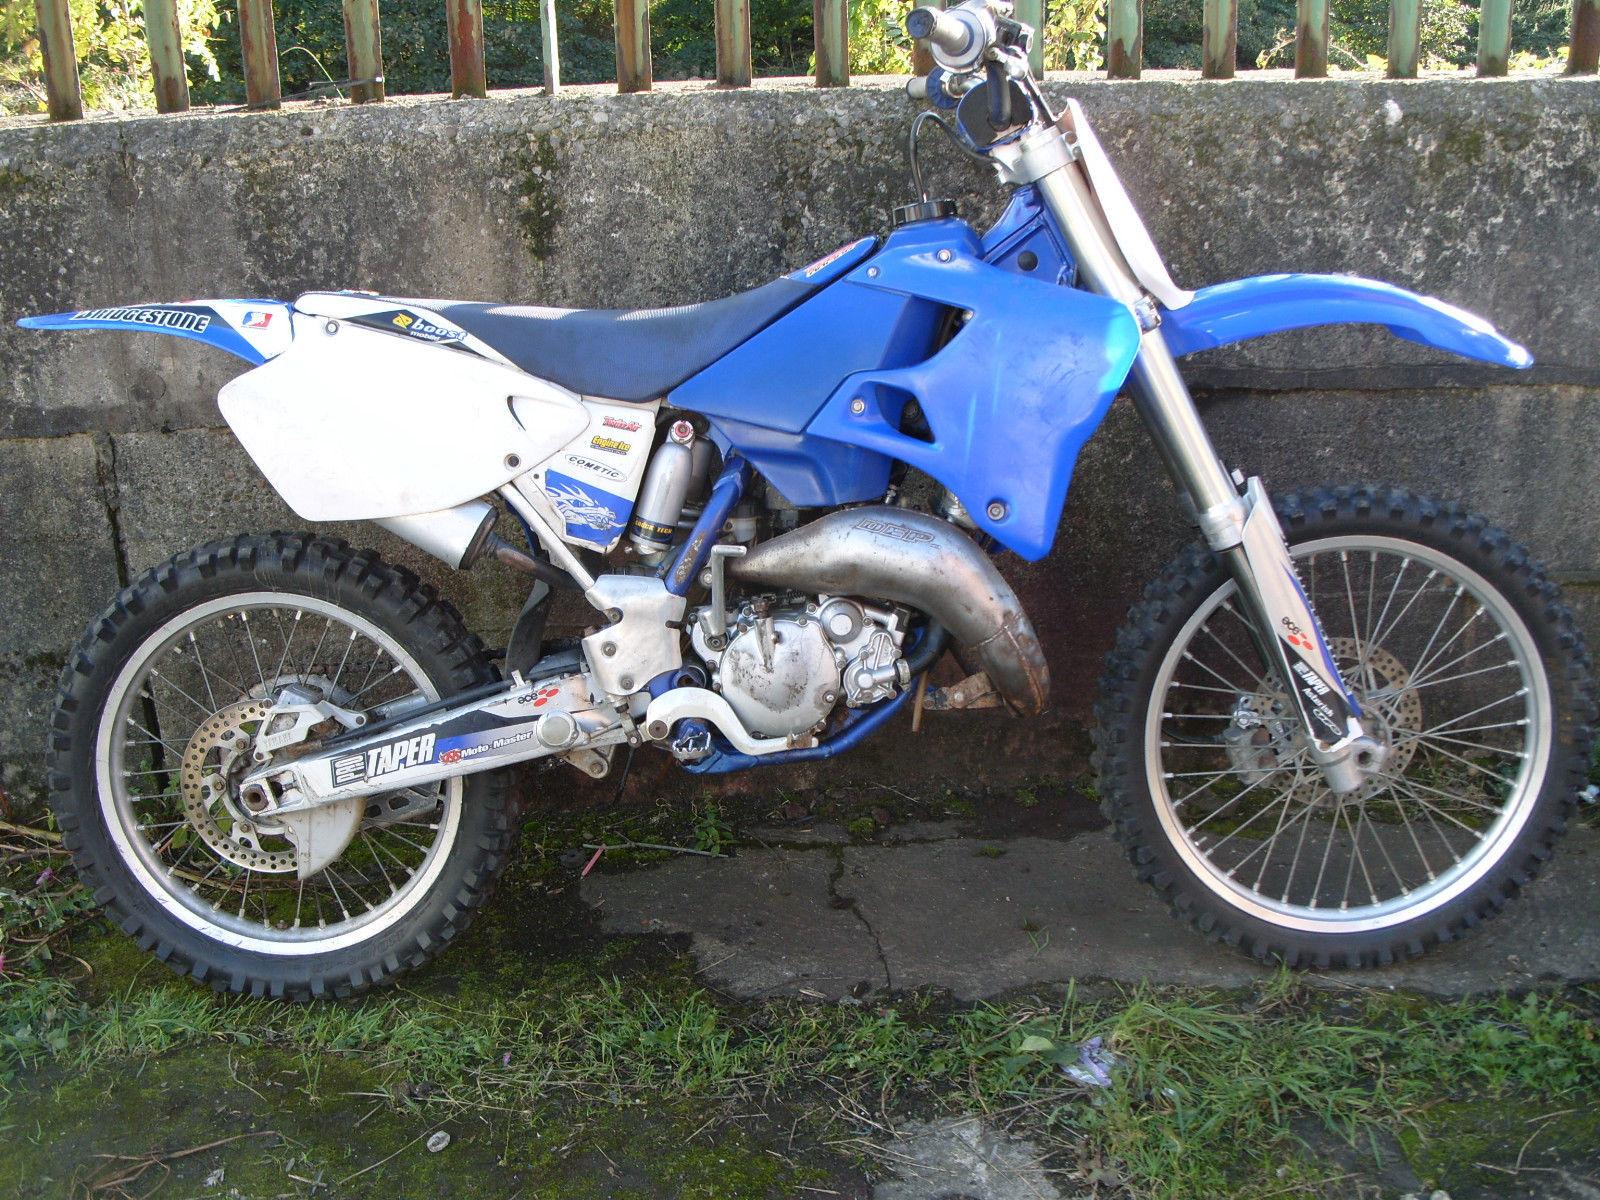 2001 Yamaha YZ 250 F: pics, specs and information